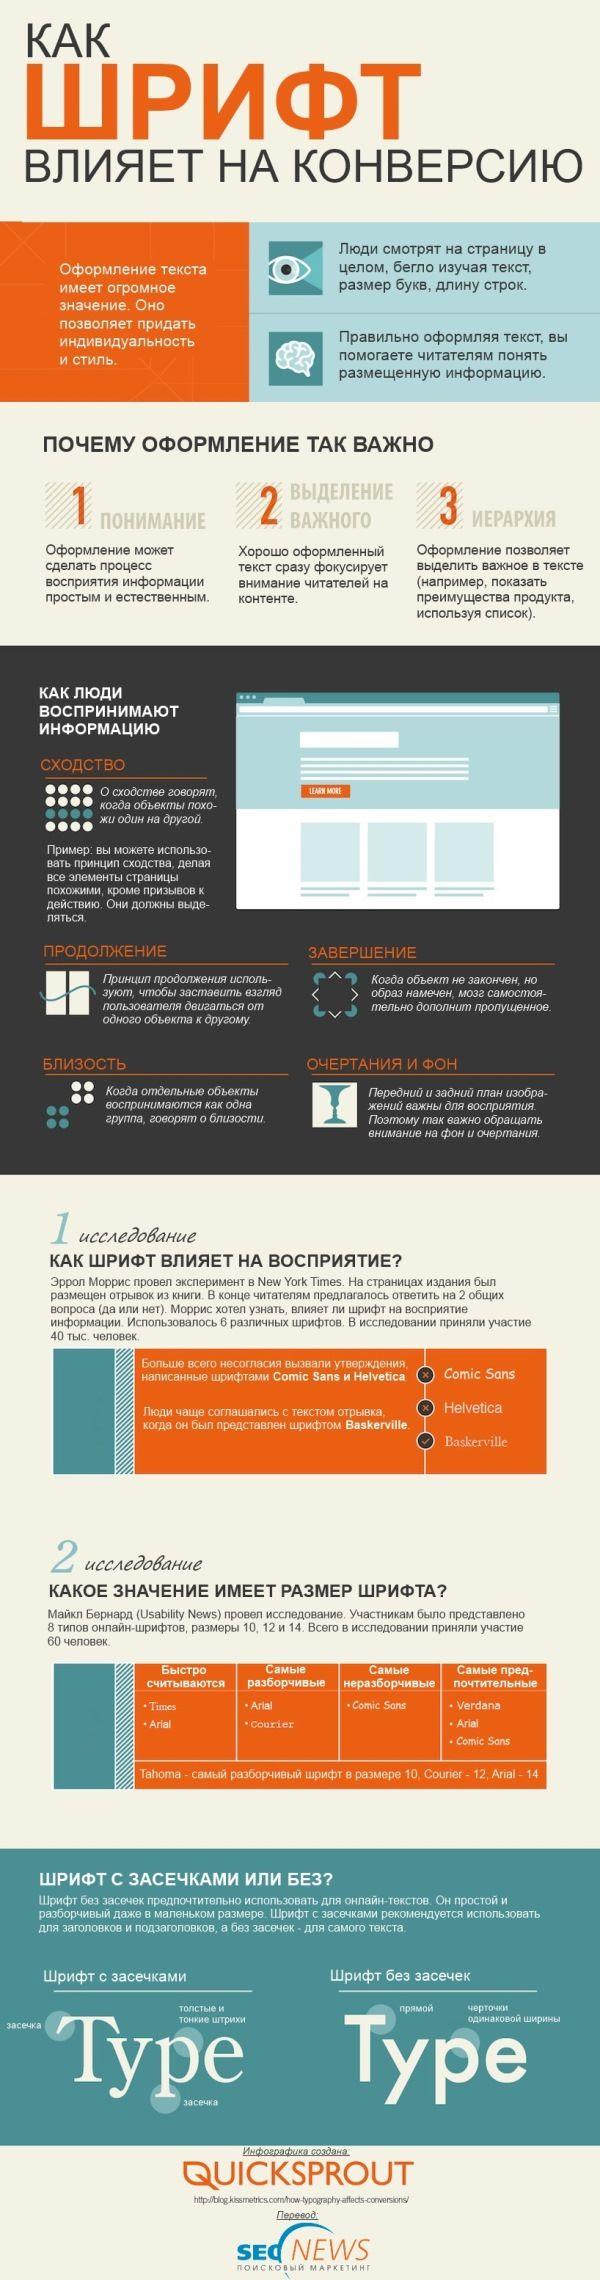 Влияние типографики на конверсию